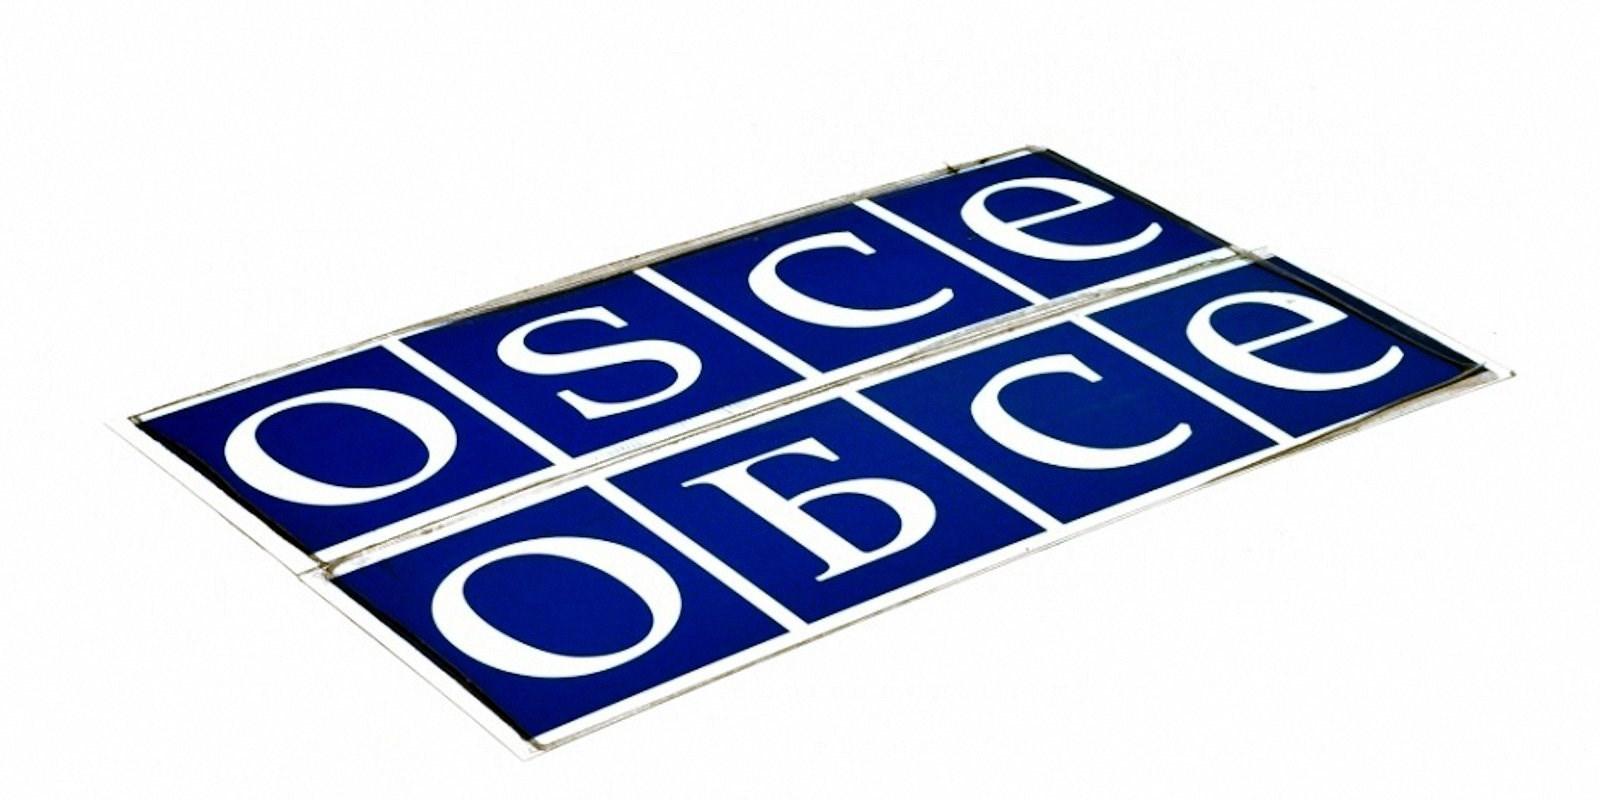 00 OSCE logo 190915